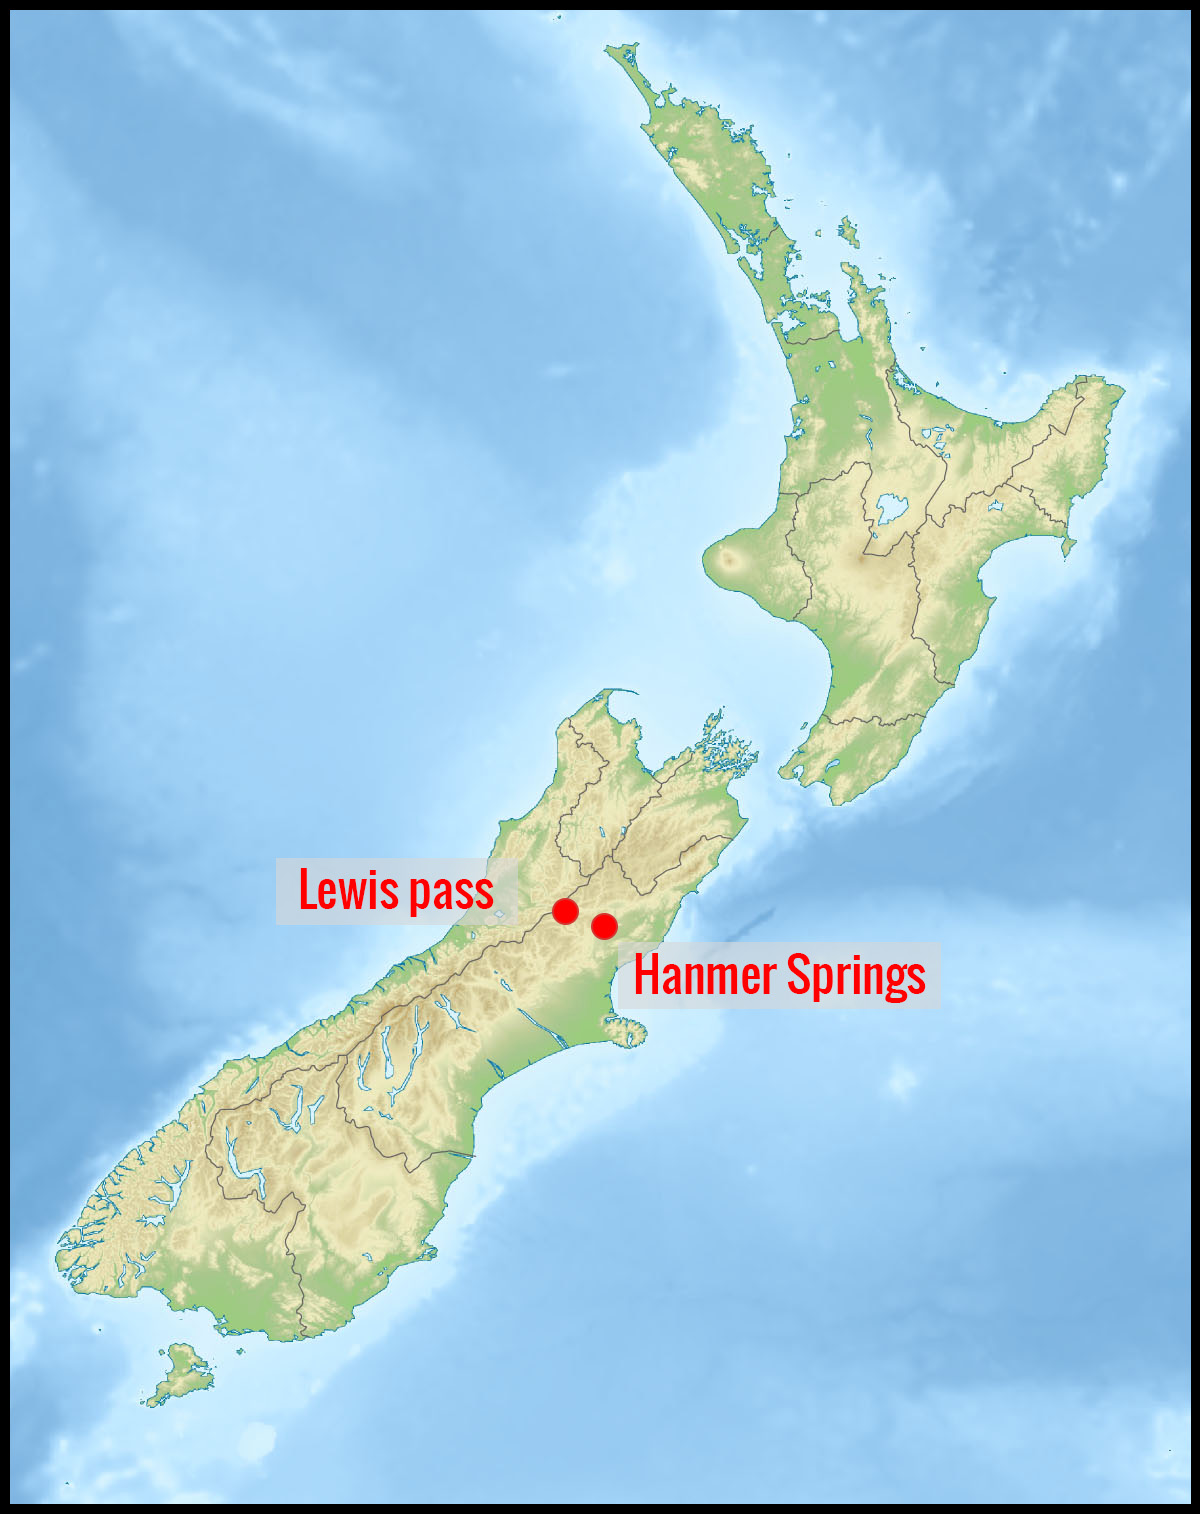 Carte Lewis pass et Hanmer Springs en Nouvelle-Zélande